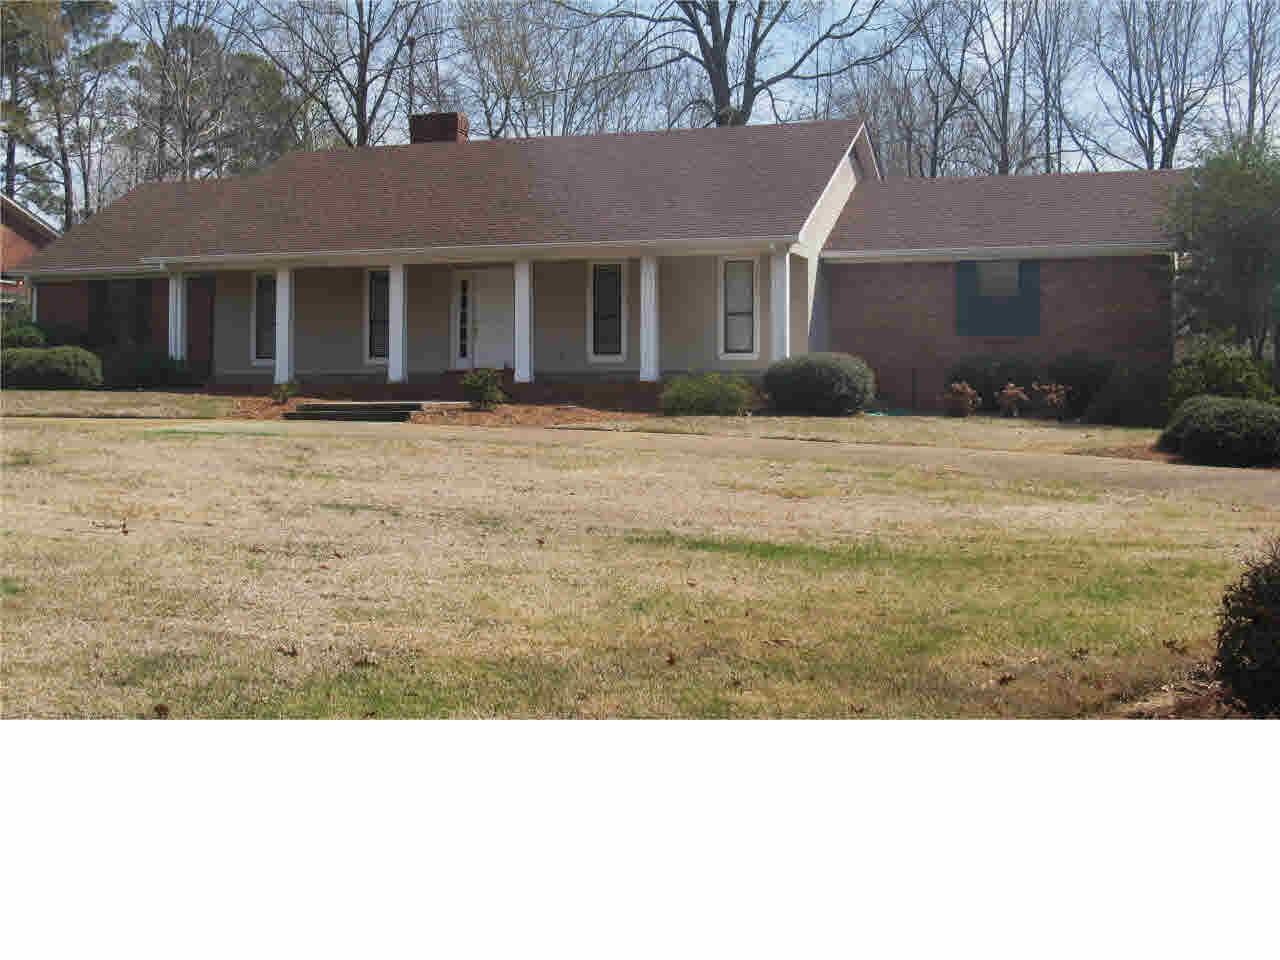 Rental Homes for Rent, ListingId:34228064, location: 124 RICHMOND DR Brandon 39042